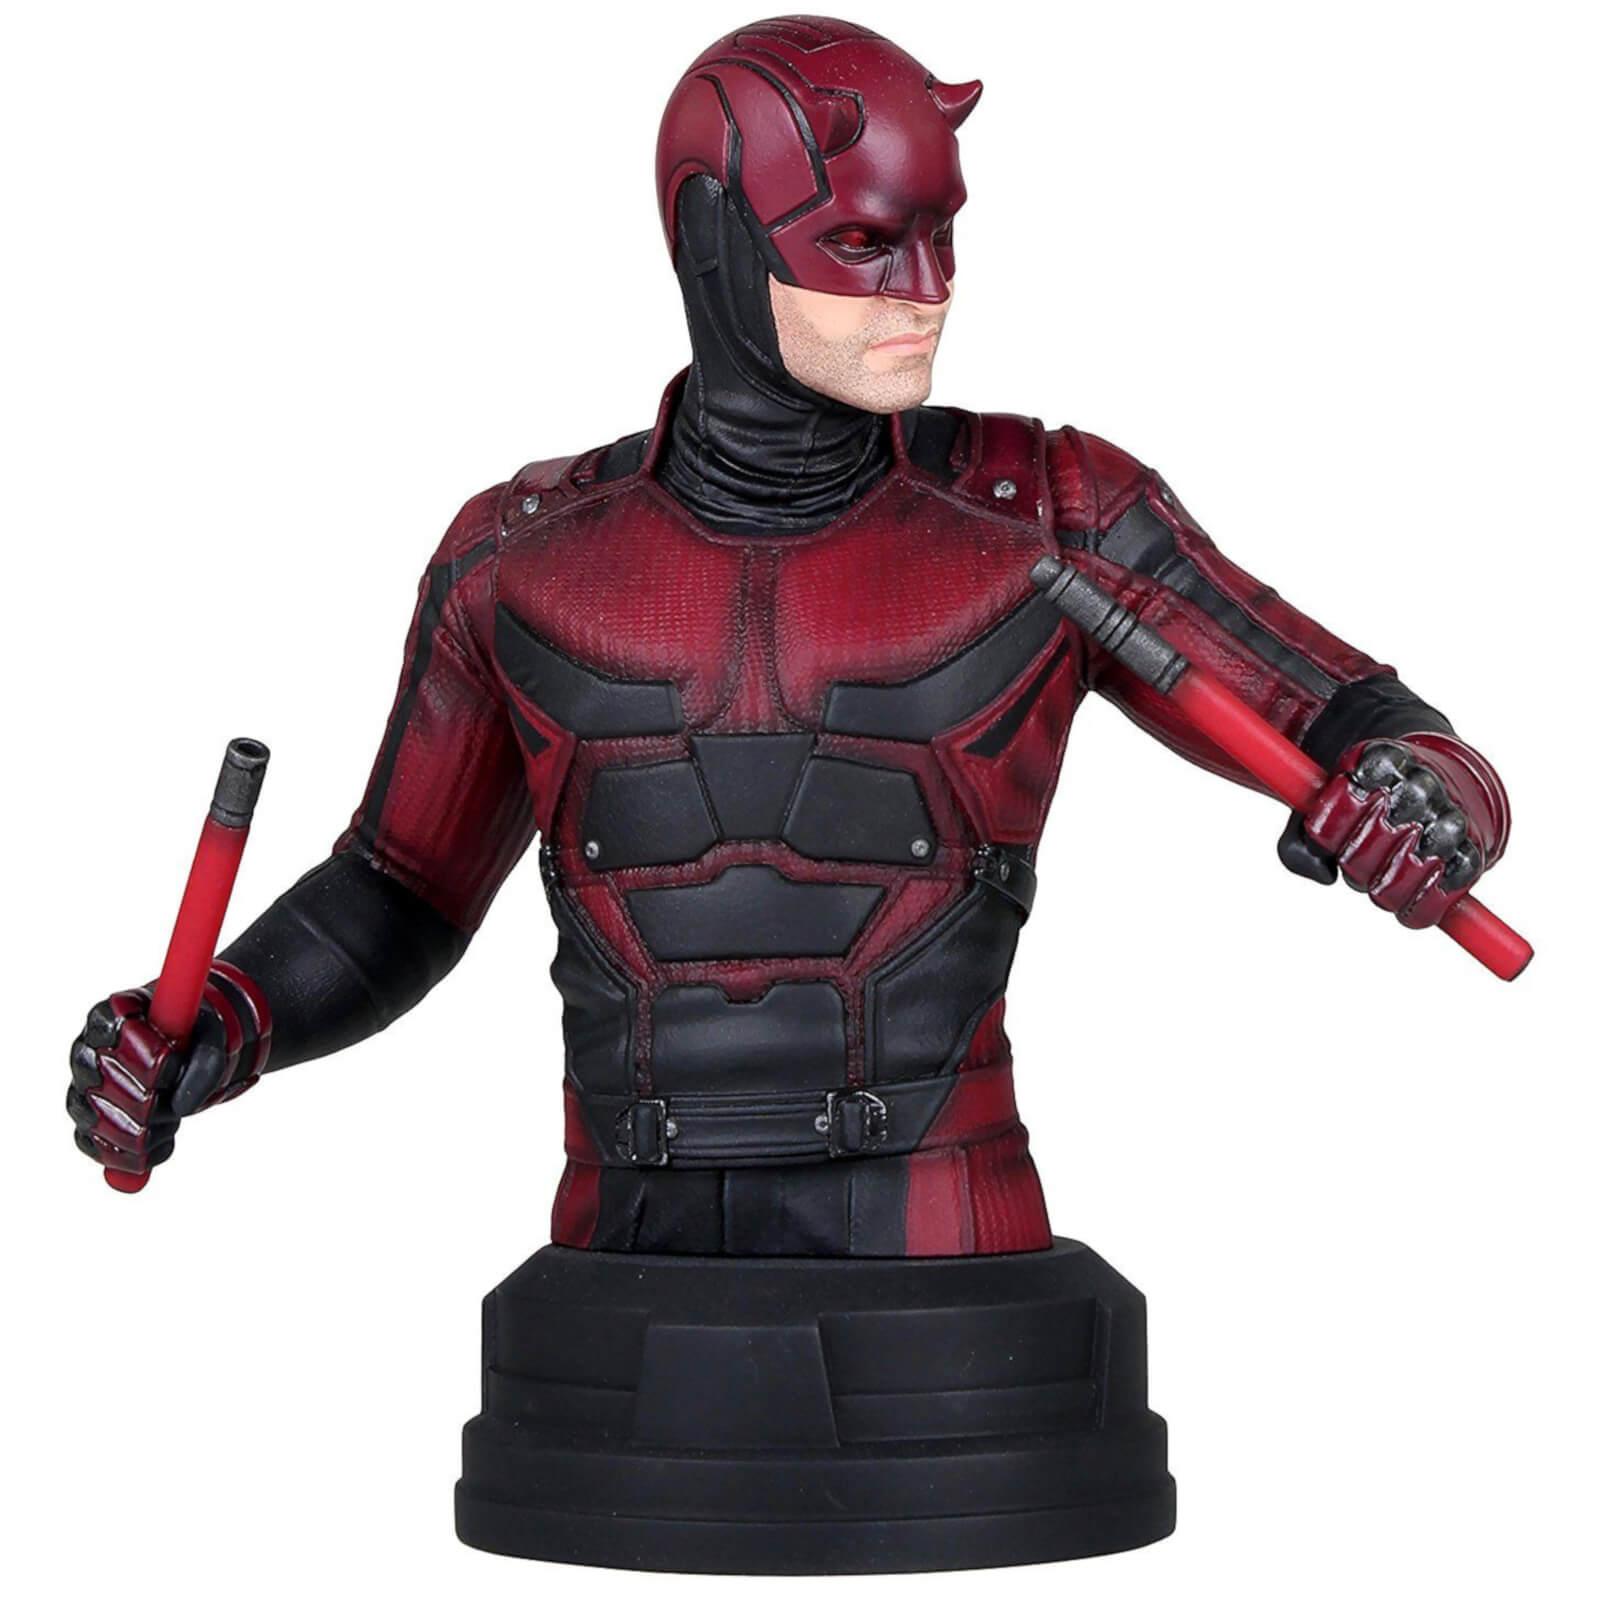 Gentle Giant Marvel Netflix Daredevil 1/6 Mini Bust - 18cm